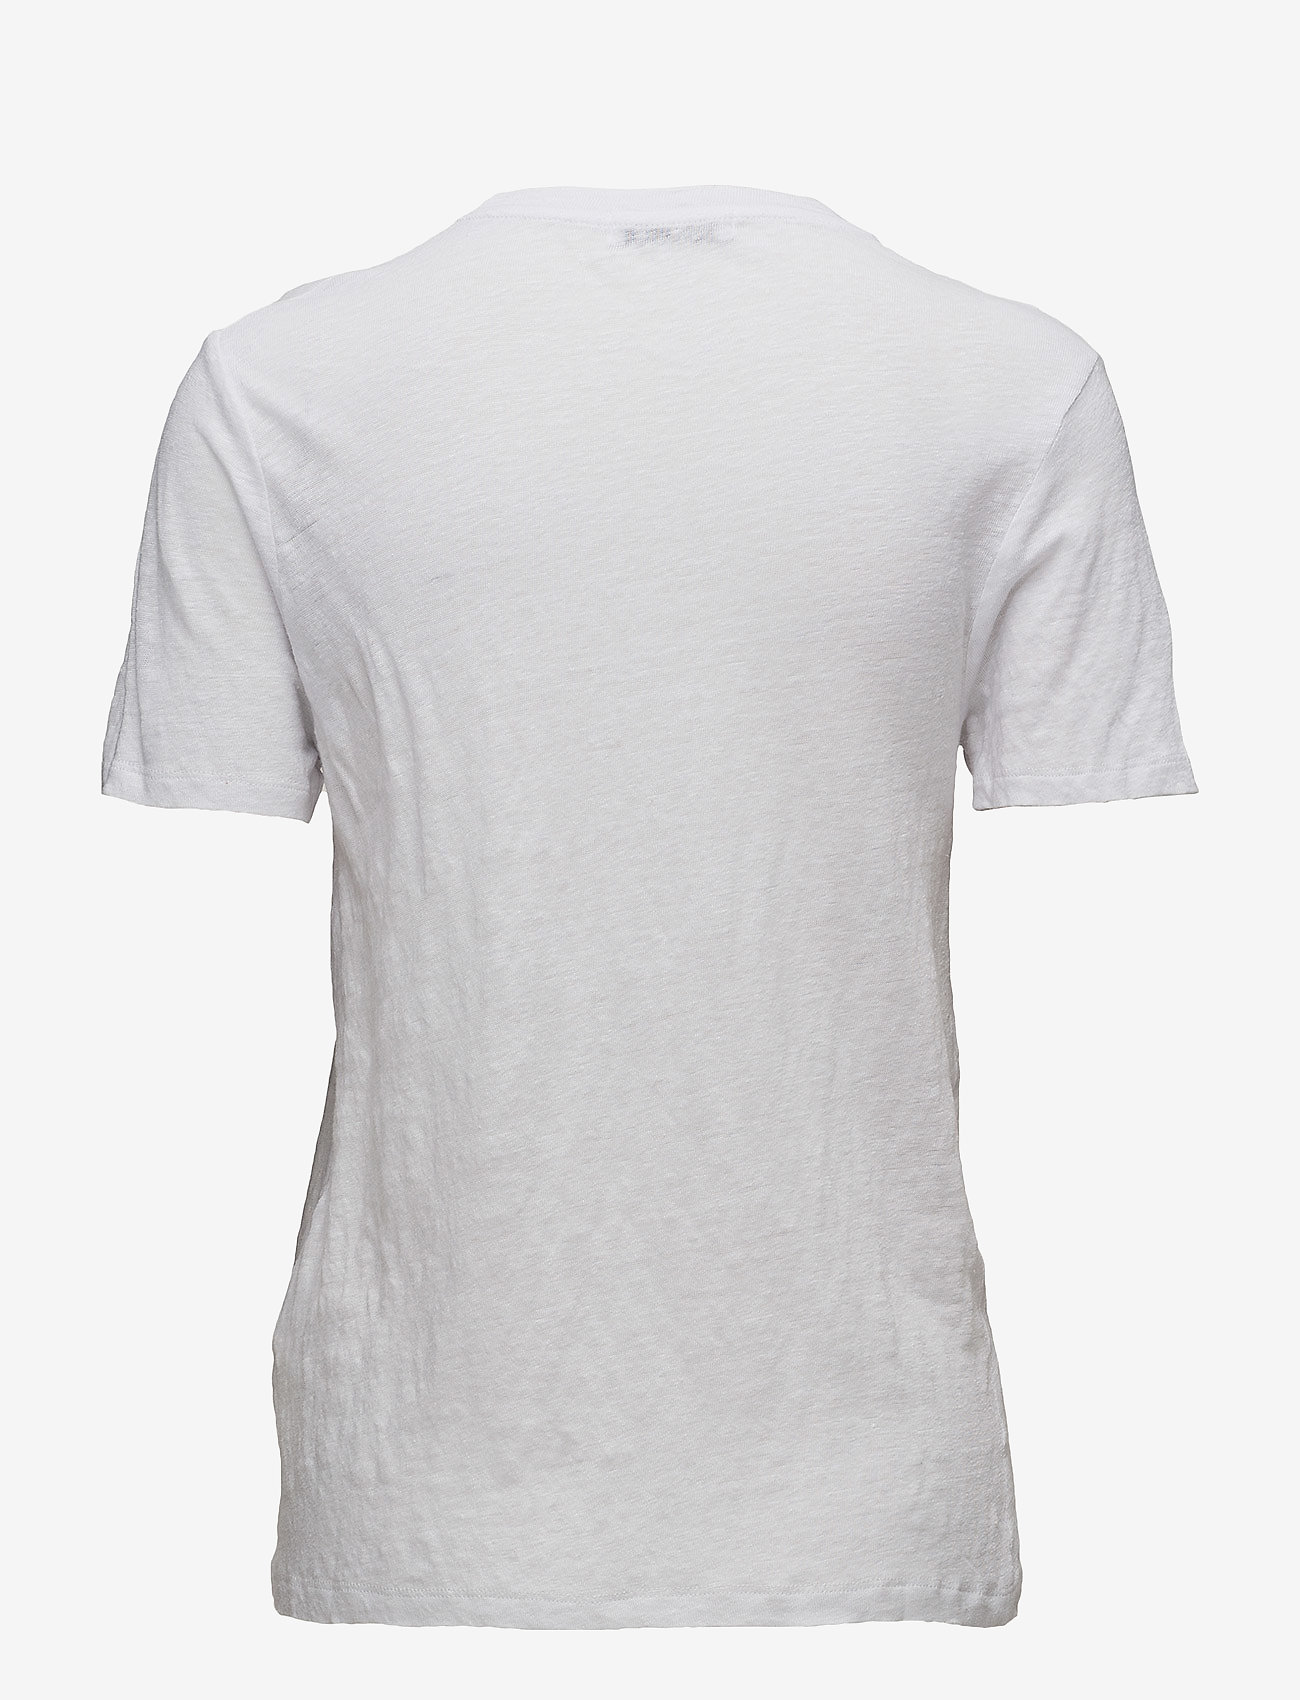 RODEBJER - RODEBJER NINJA LINEN - t-shirts - white - 1